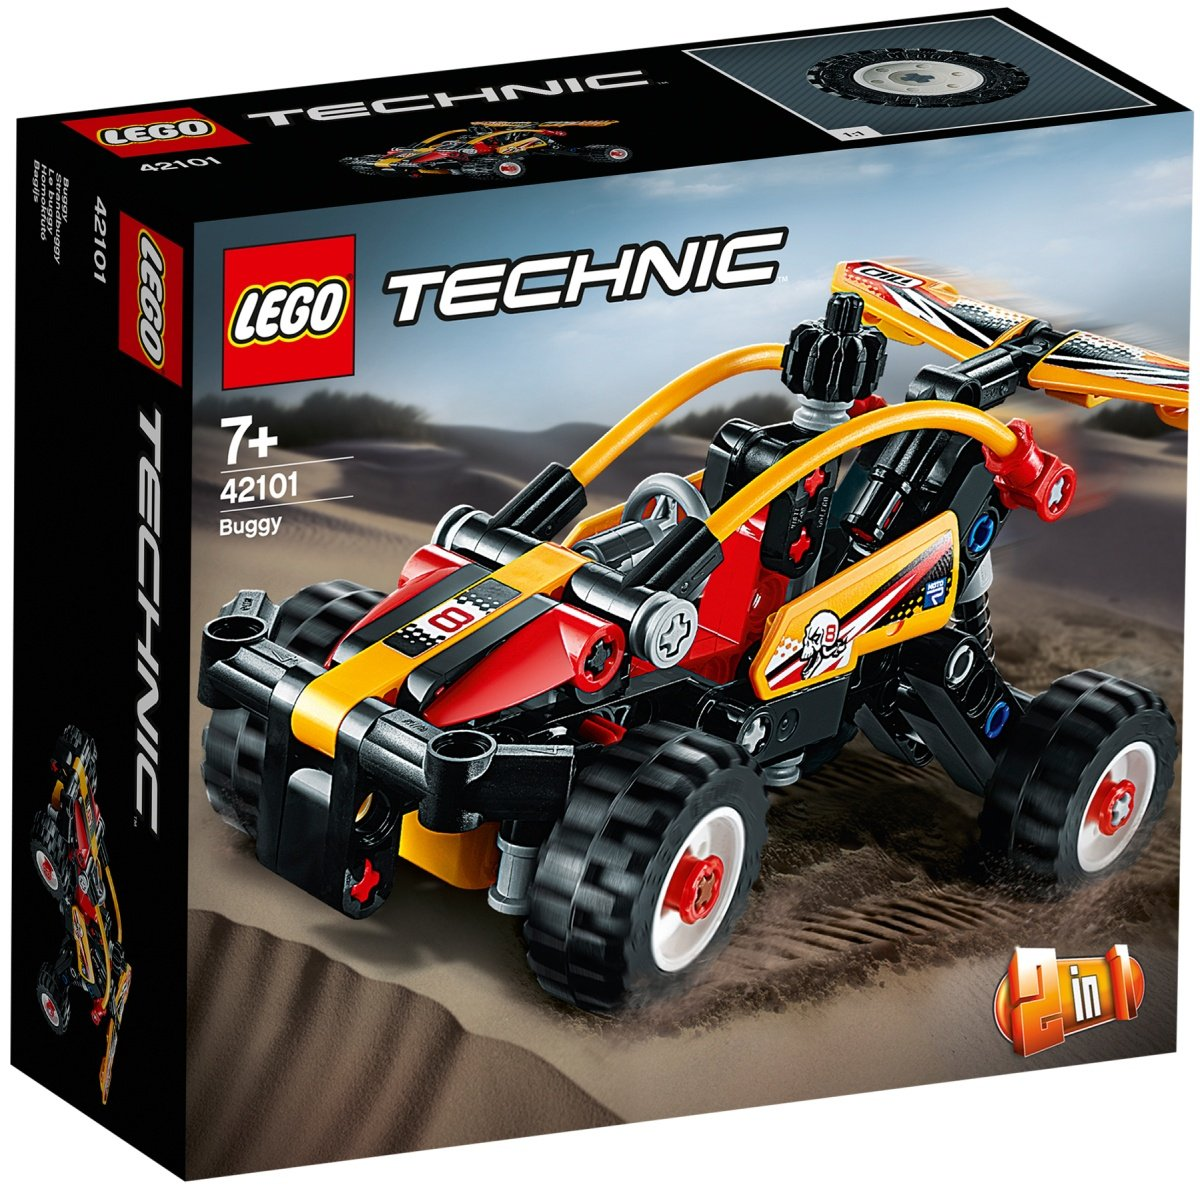 42101-lego-technic-buggy-strand-box zusammengebaut.com